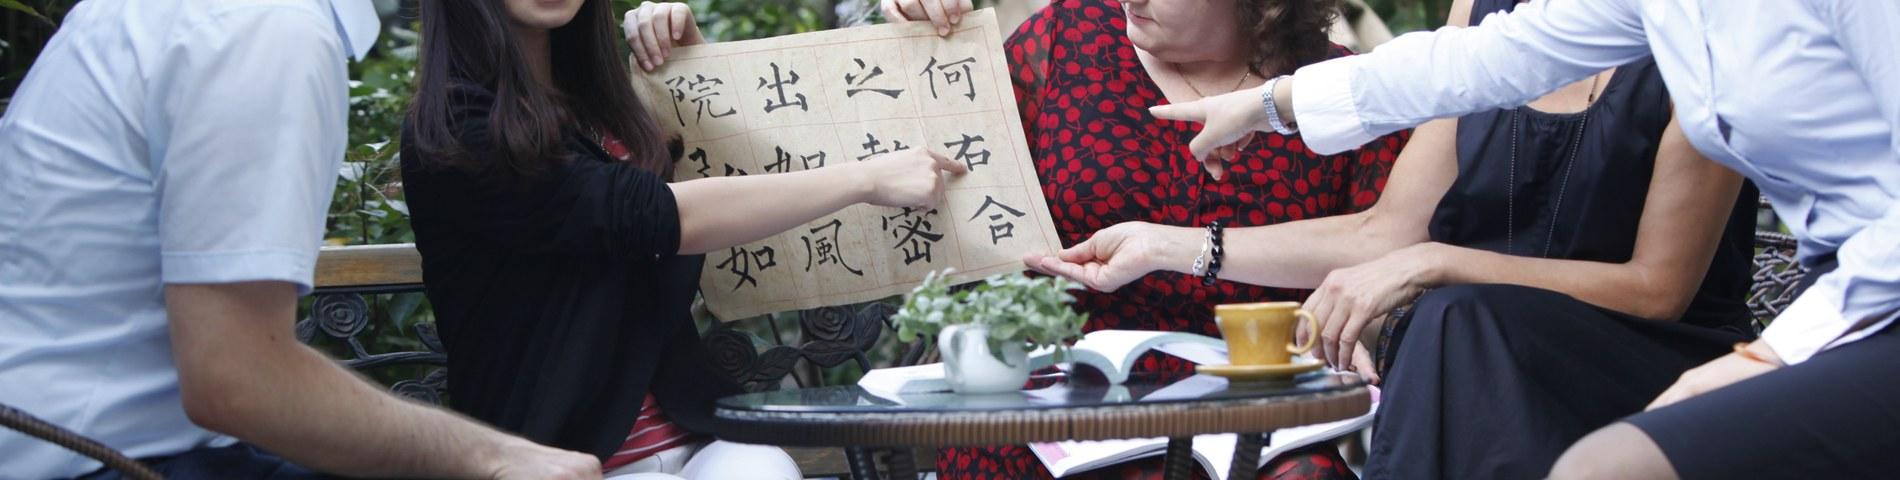 Imagen 1 de la escuela Hanbridge Mandarin School